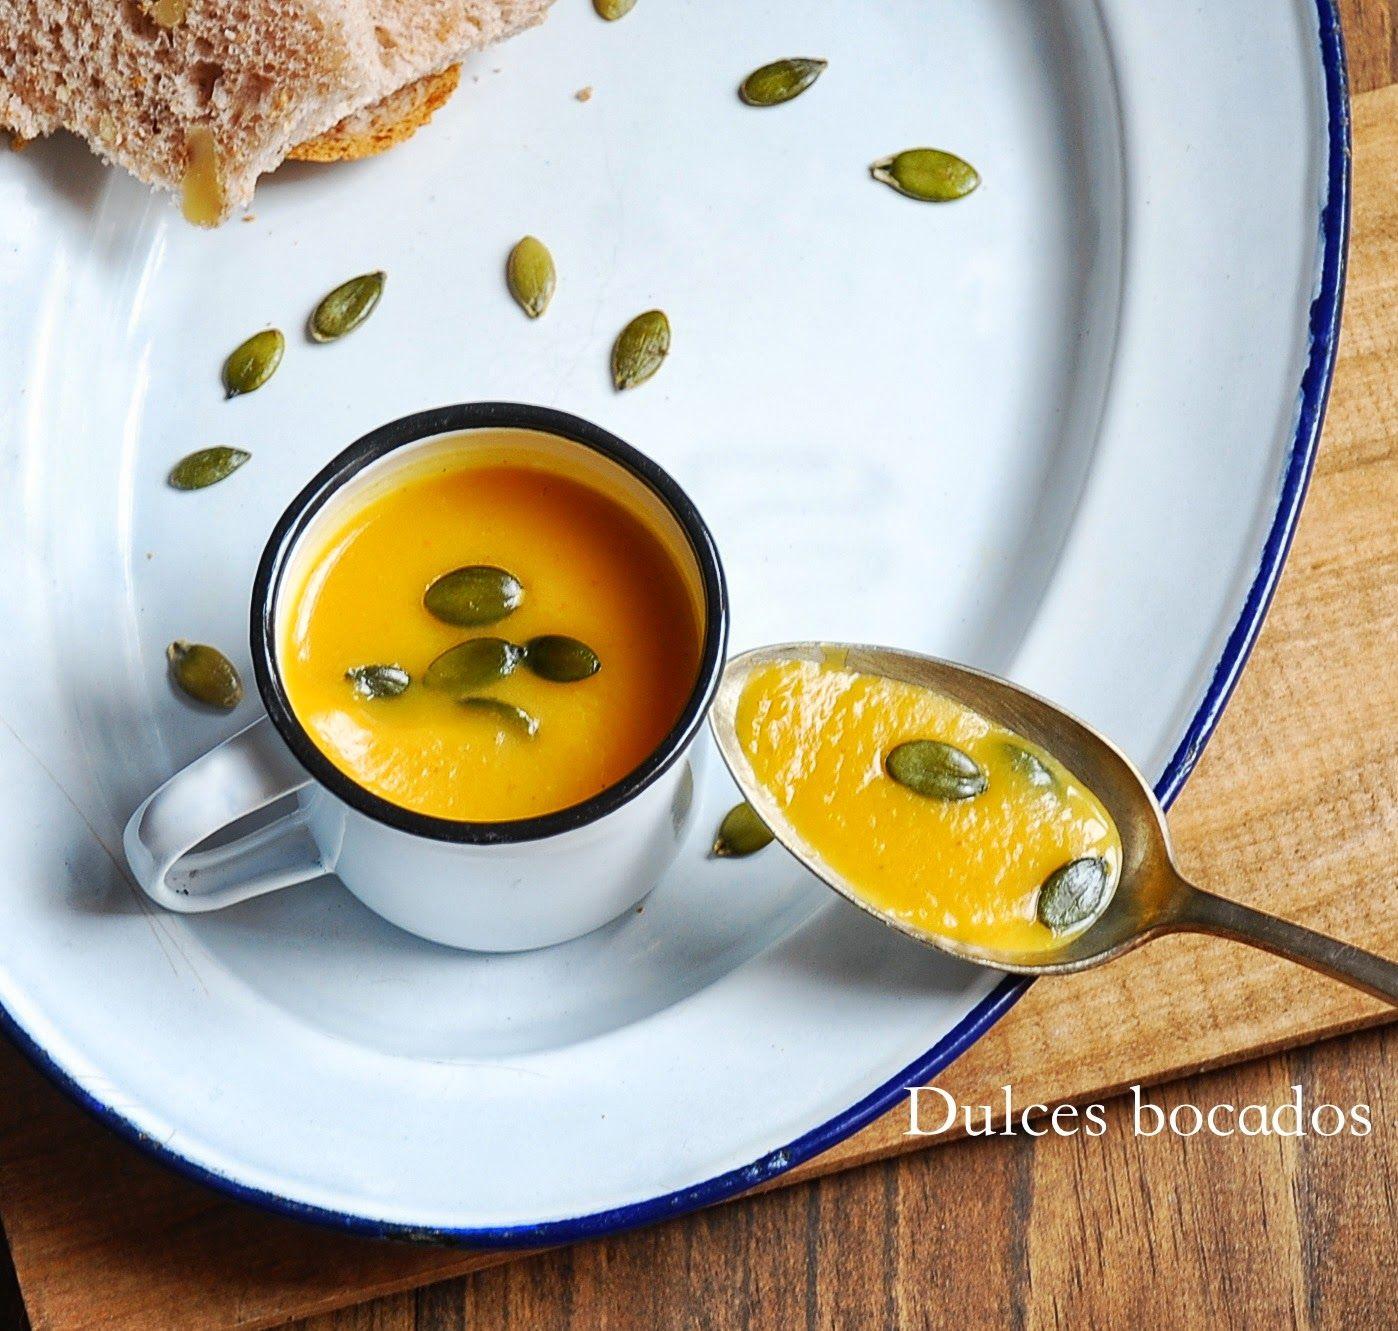 Cocinar Crema De Calabaza | Dulces Bocados Crema De Calabaza Con Curry Recetas Para Cocinar